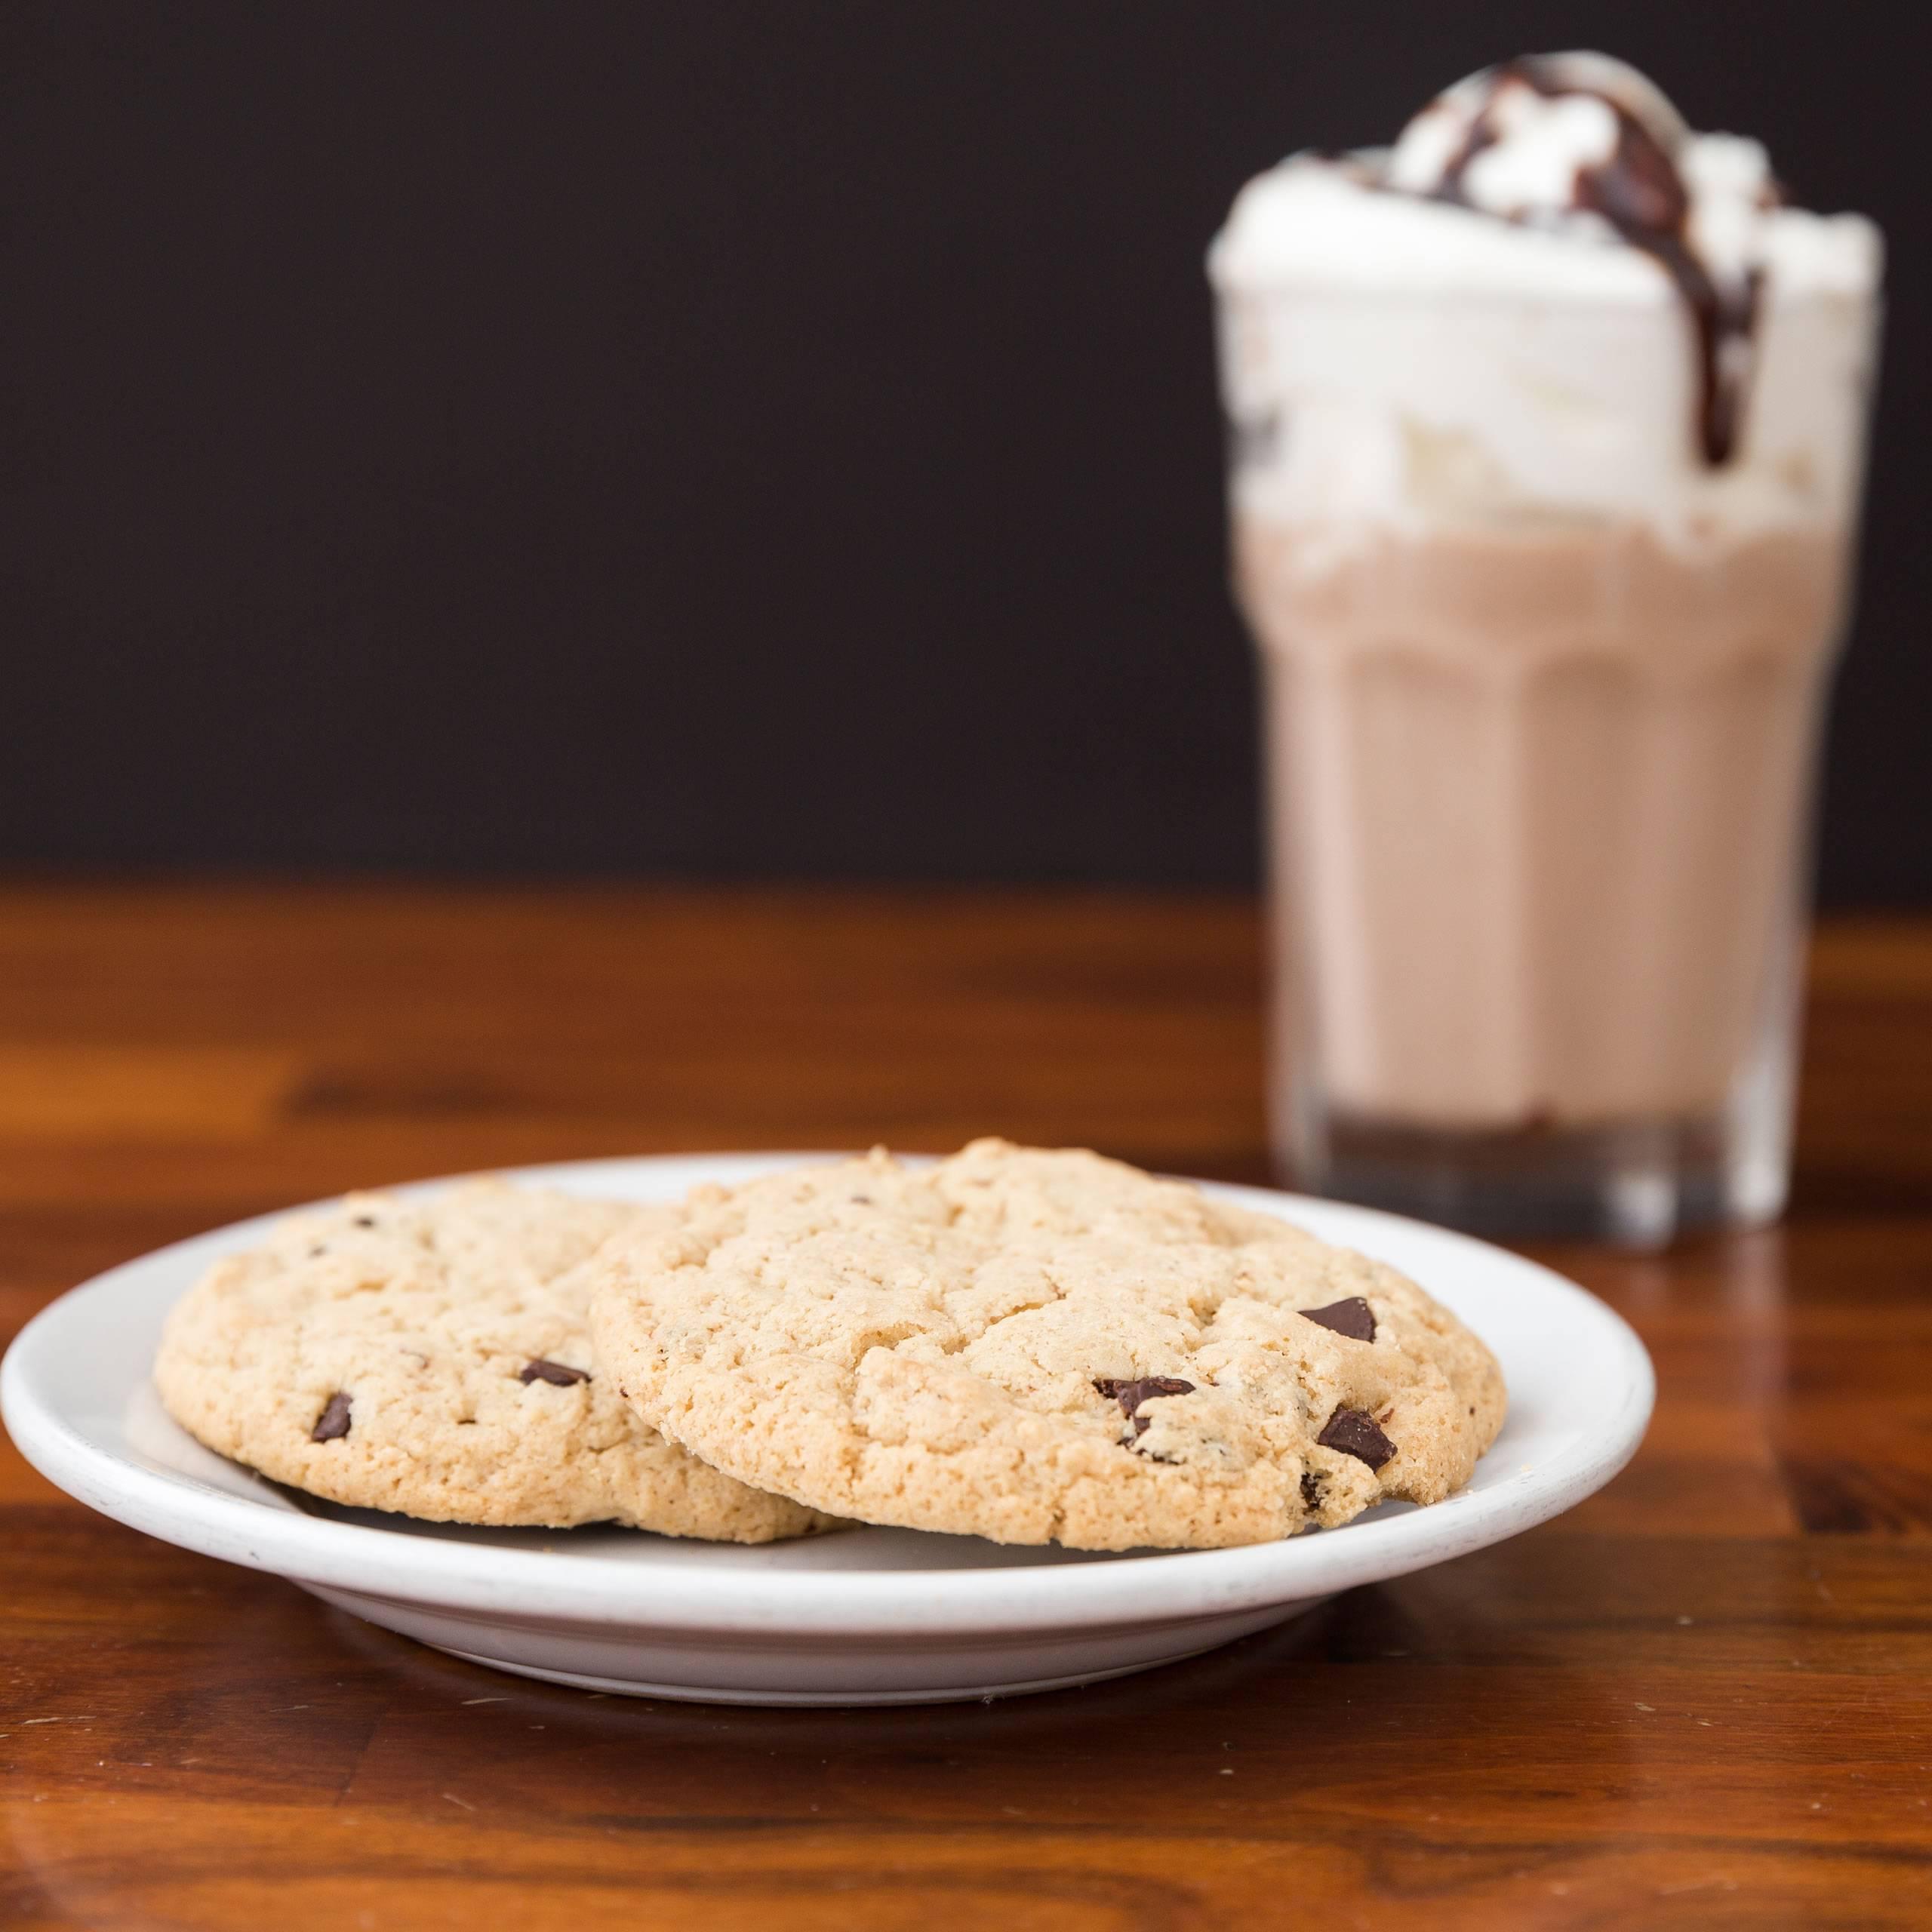 Buddy's Chocolate Chip Cookies